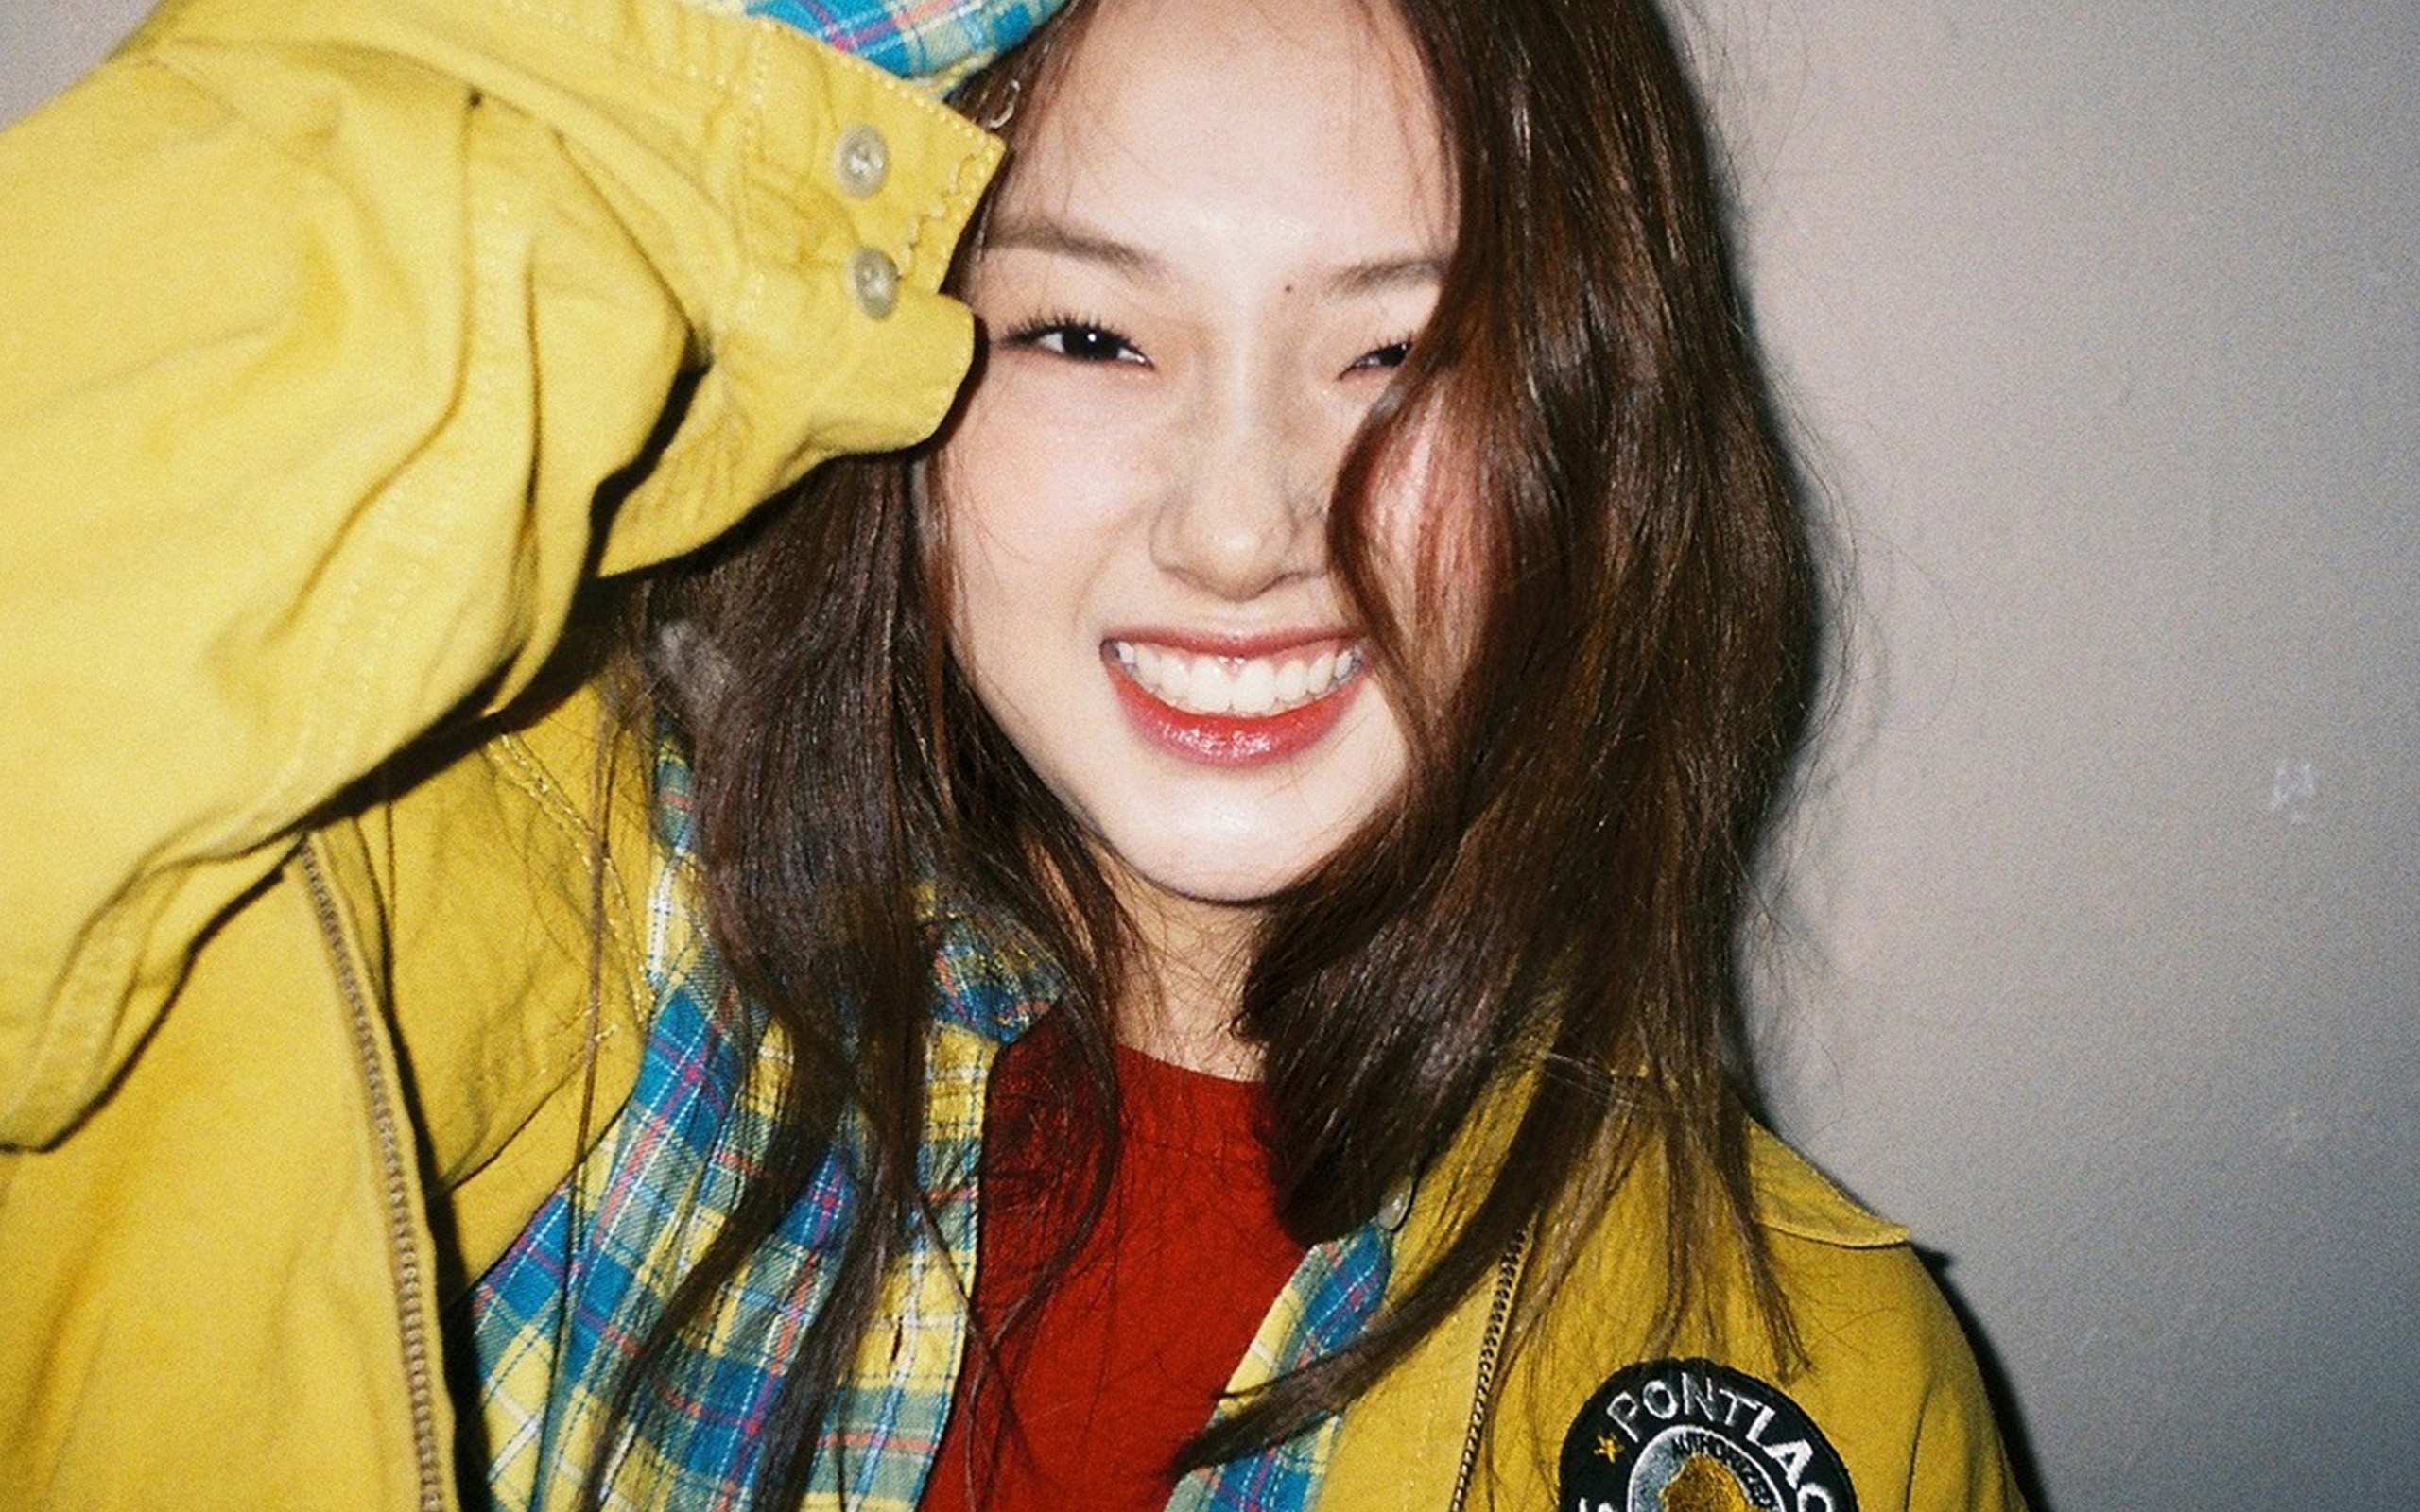 ho63-cute-kpop-girl-pontlac-korean-asian-wallpaper